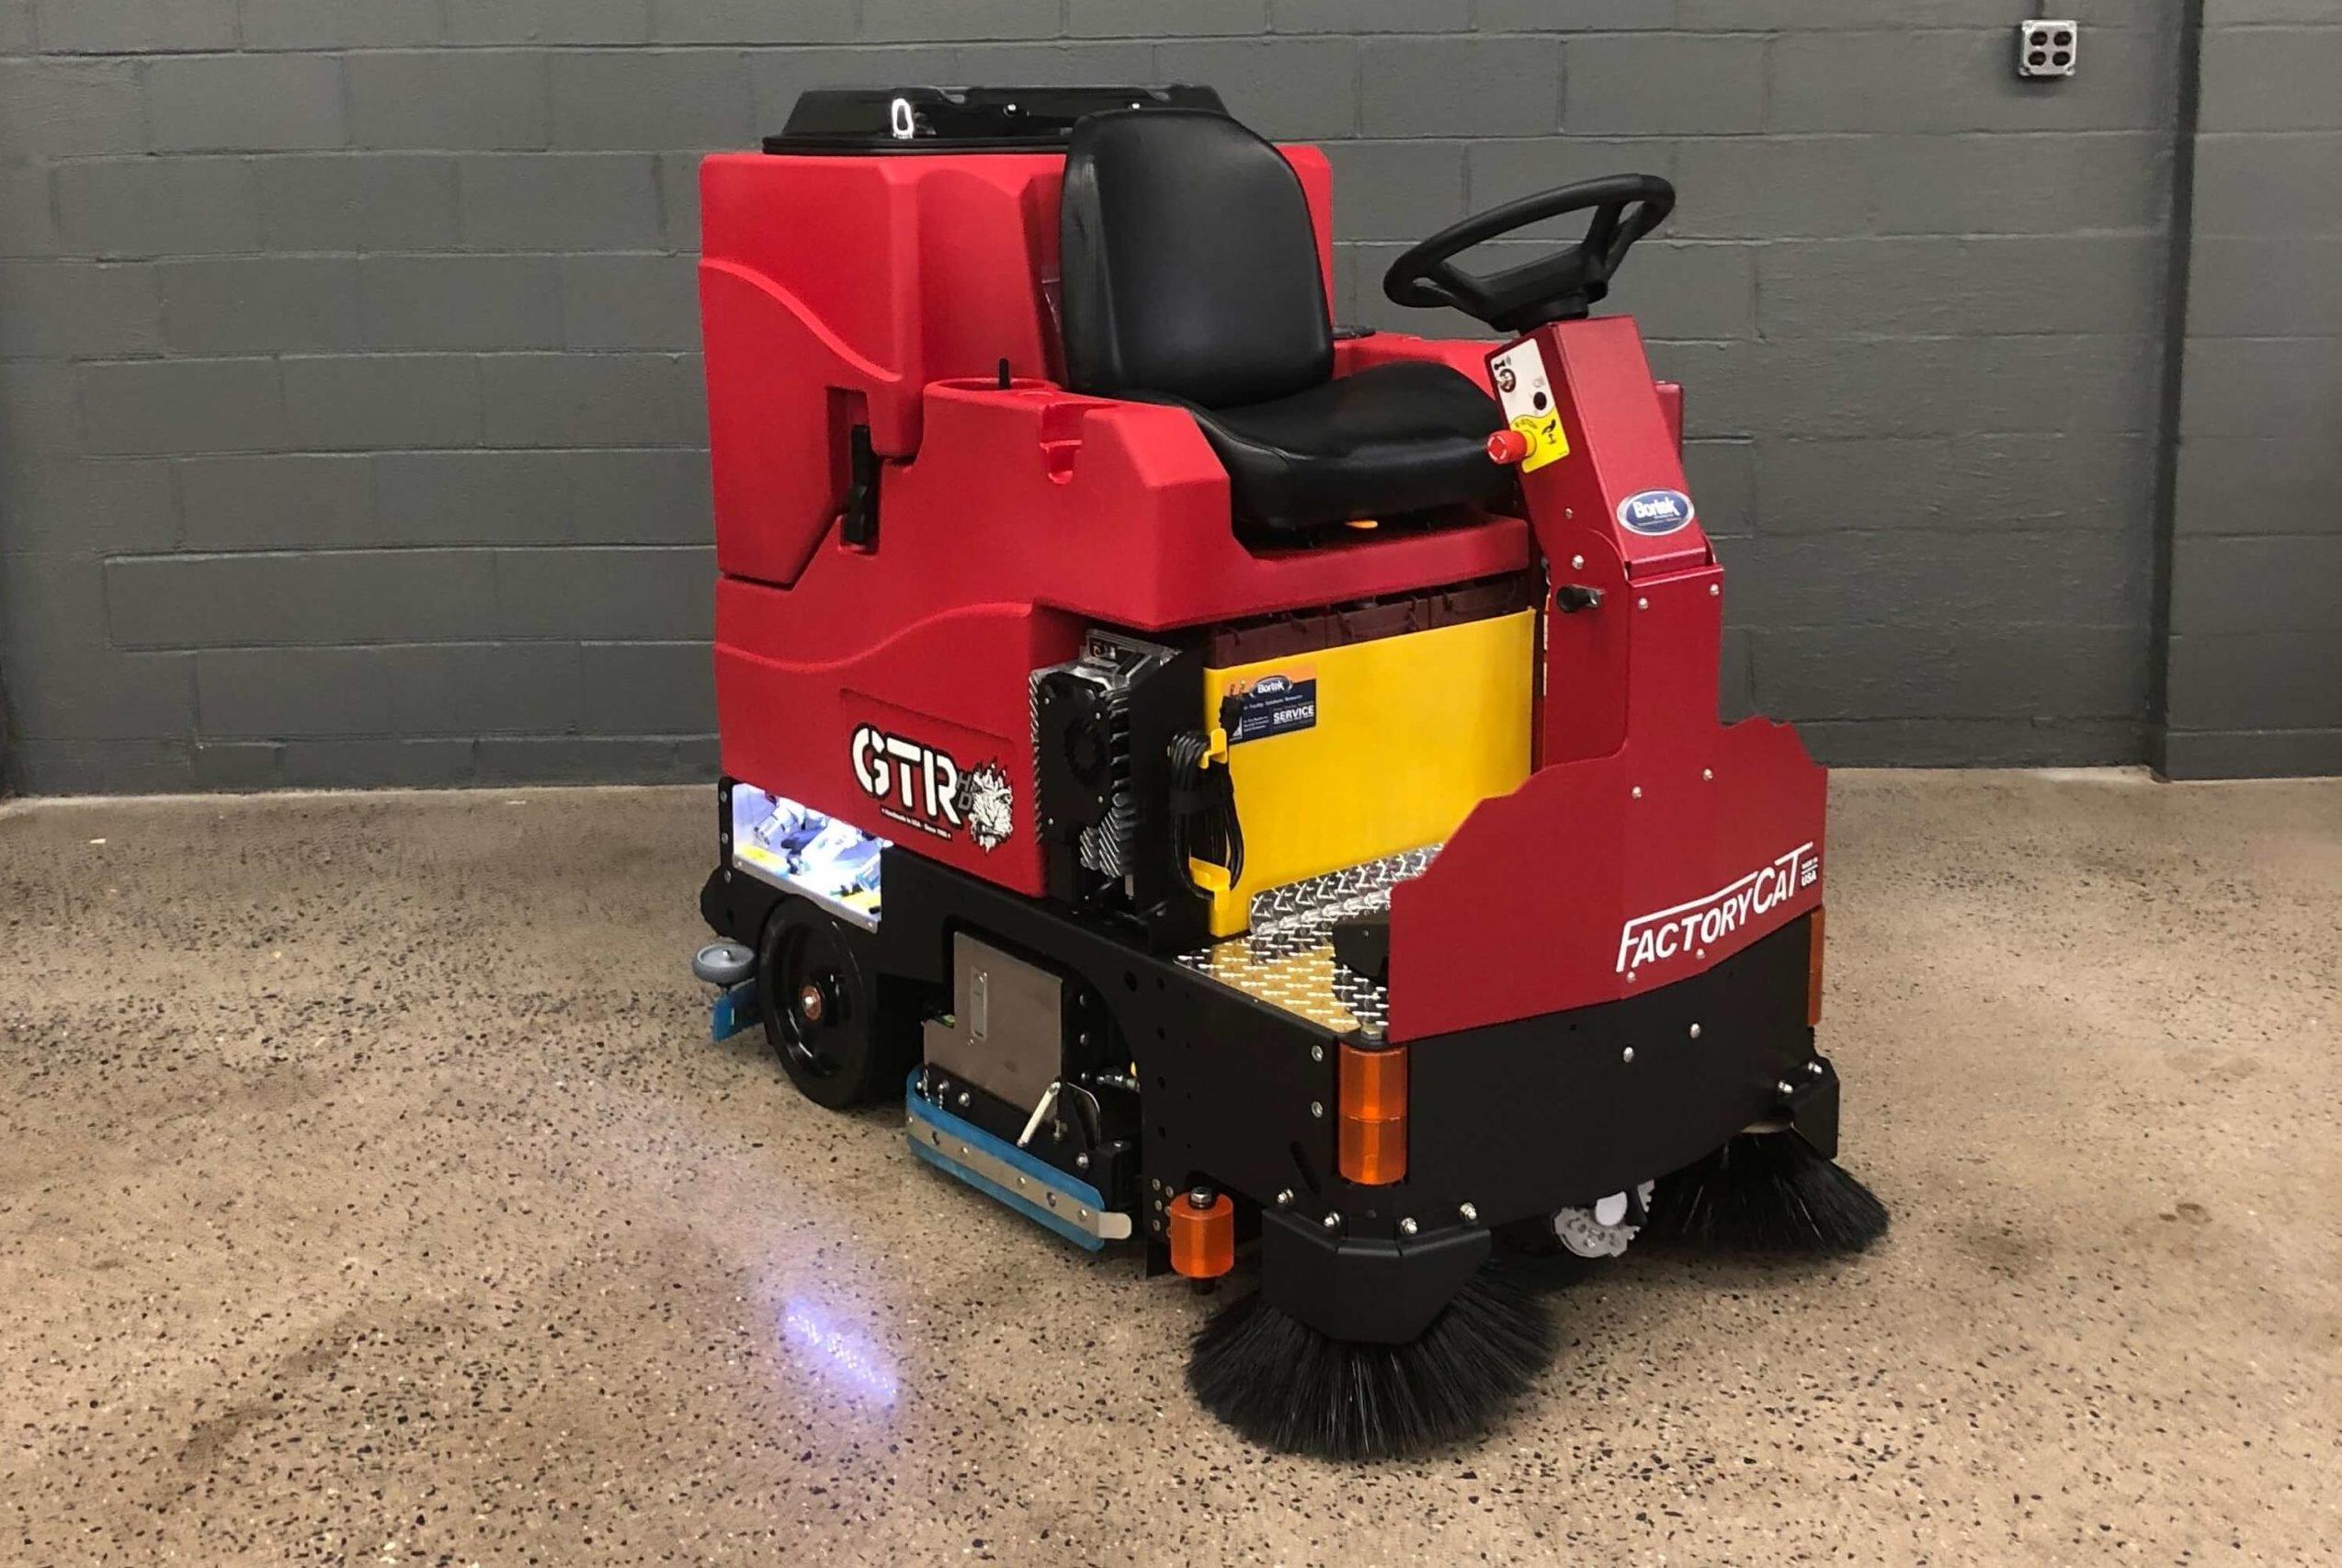 Factory-Cat-GTR-Rider-Floor-Scrubber-Sweeper-FR-Bortek-Industries-Inc-scaled